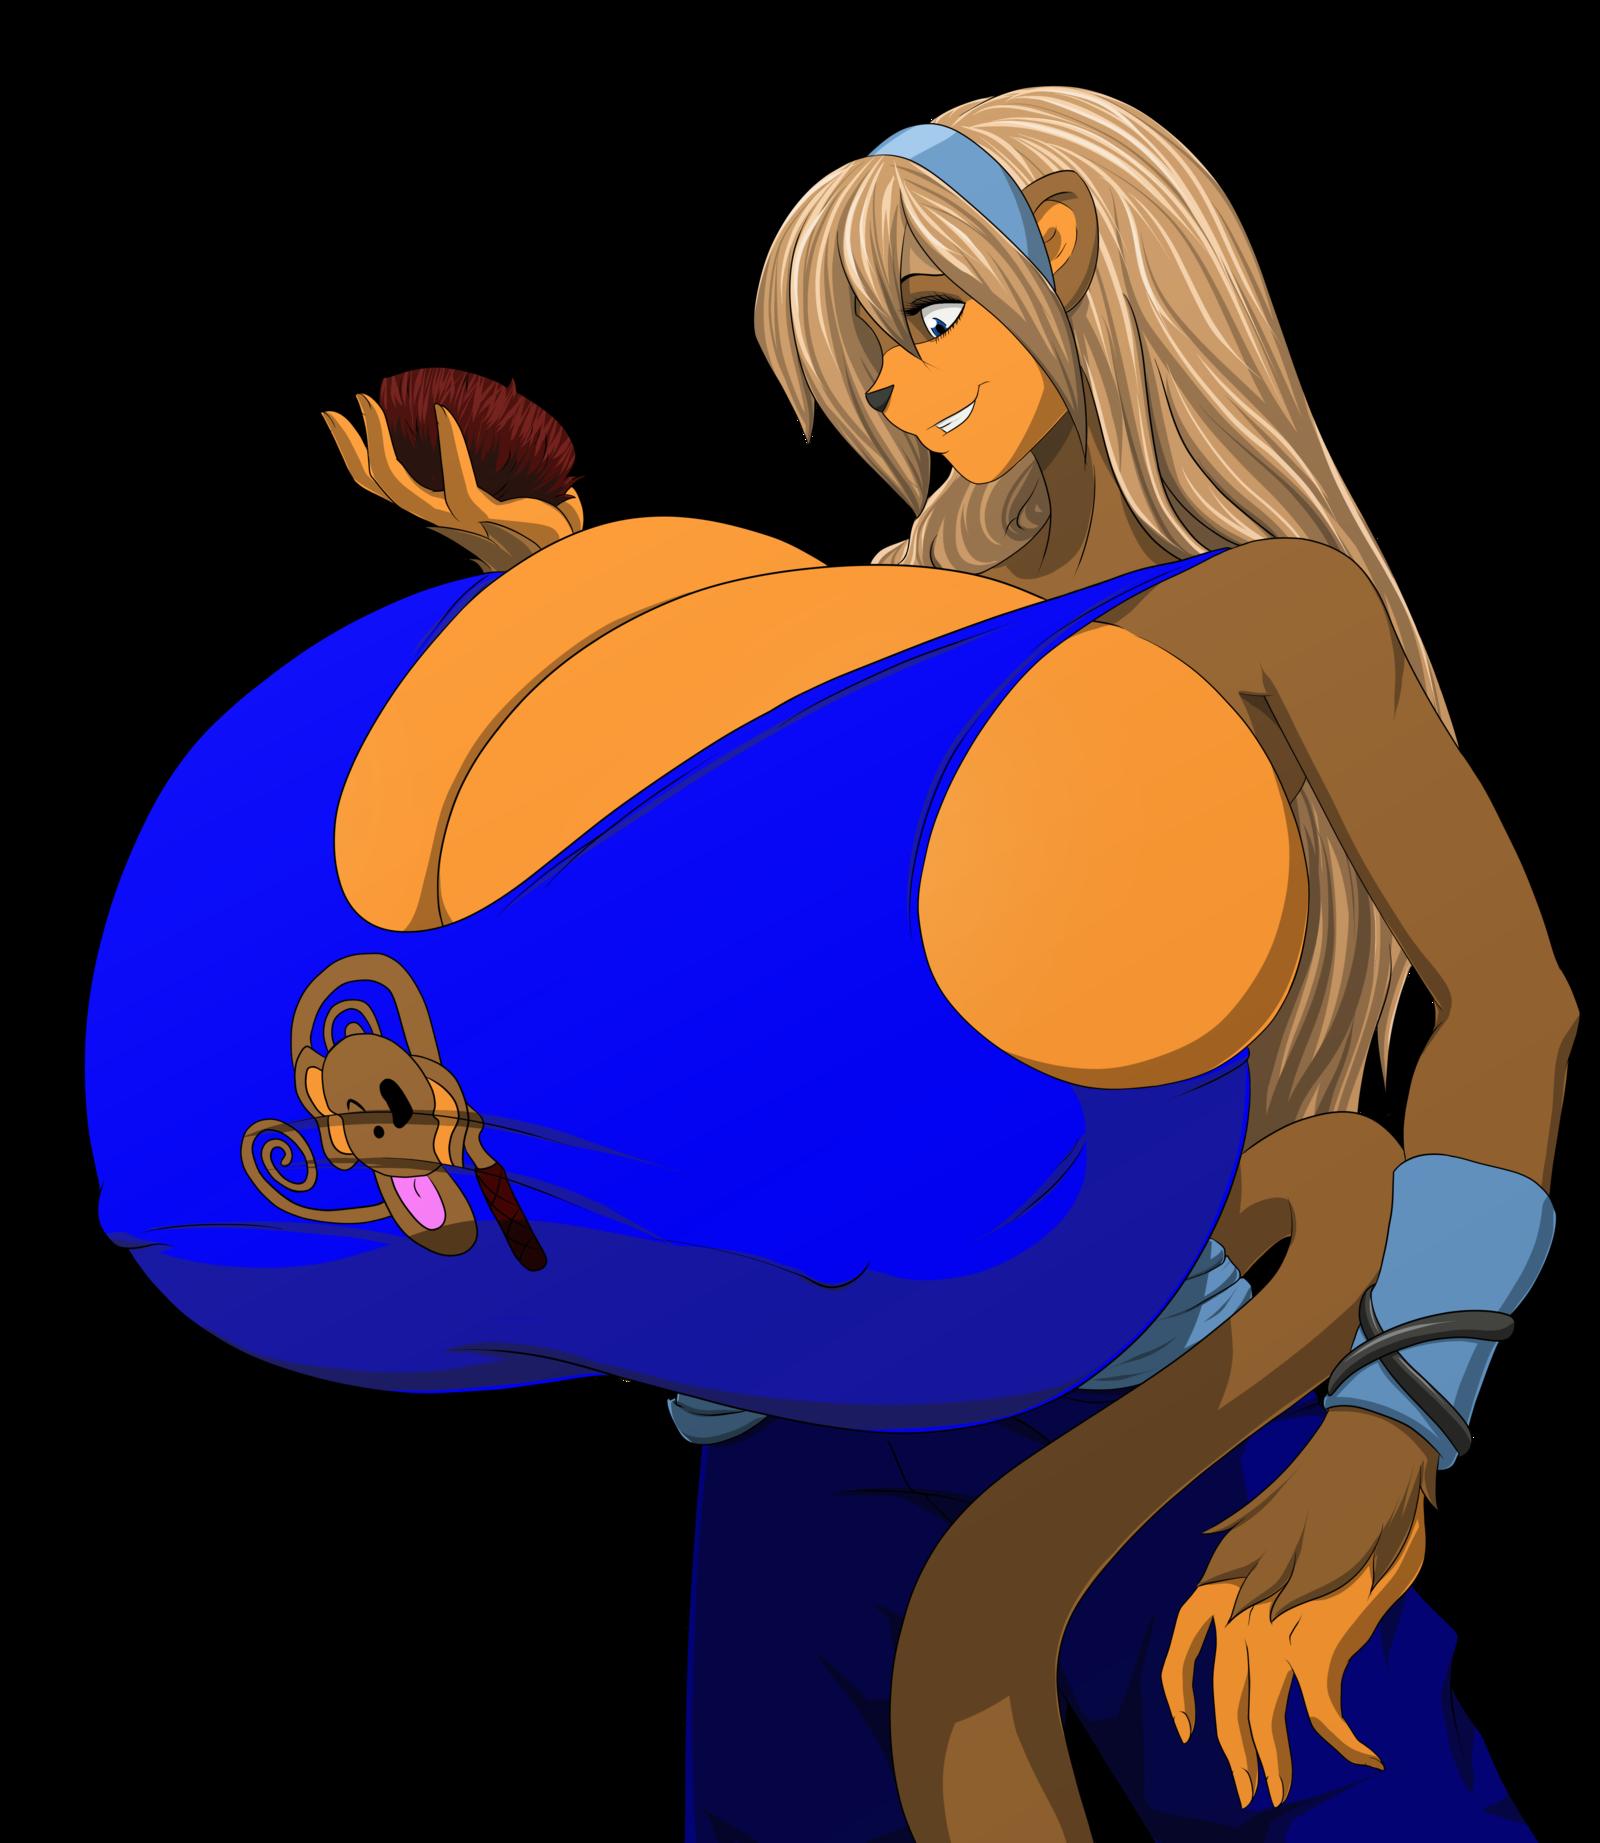 png papua lady porn